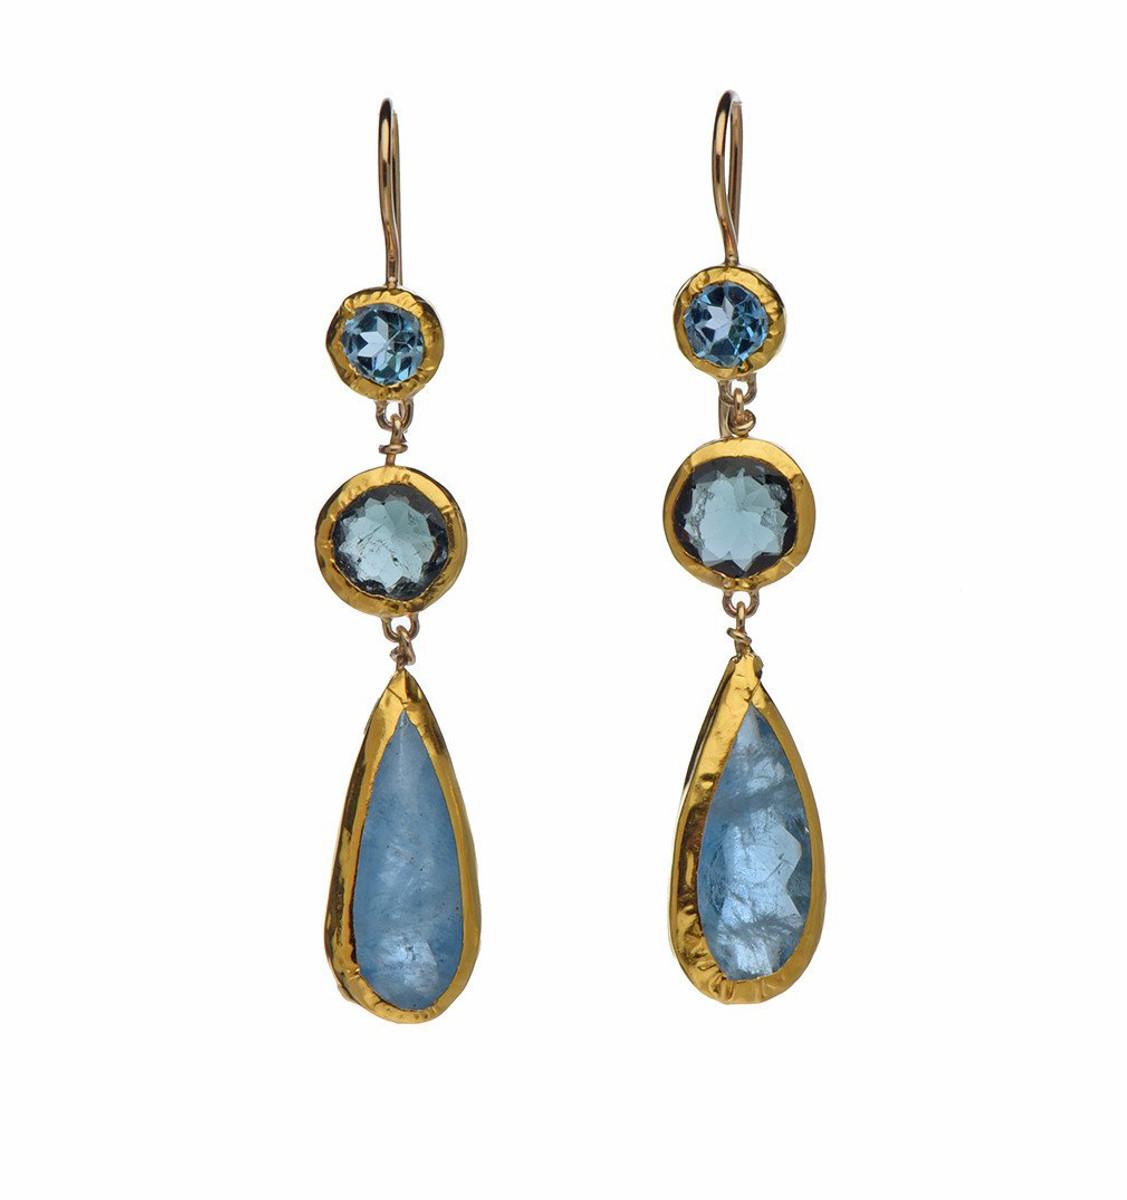 Long Blue Topaz and Aquamarine Earrings - New Arrival